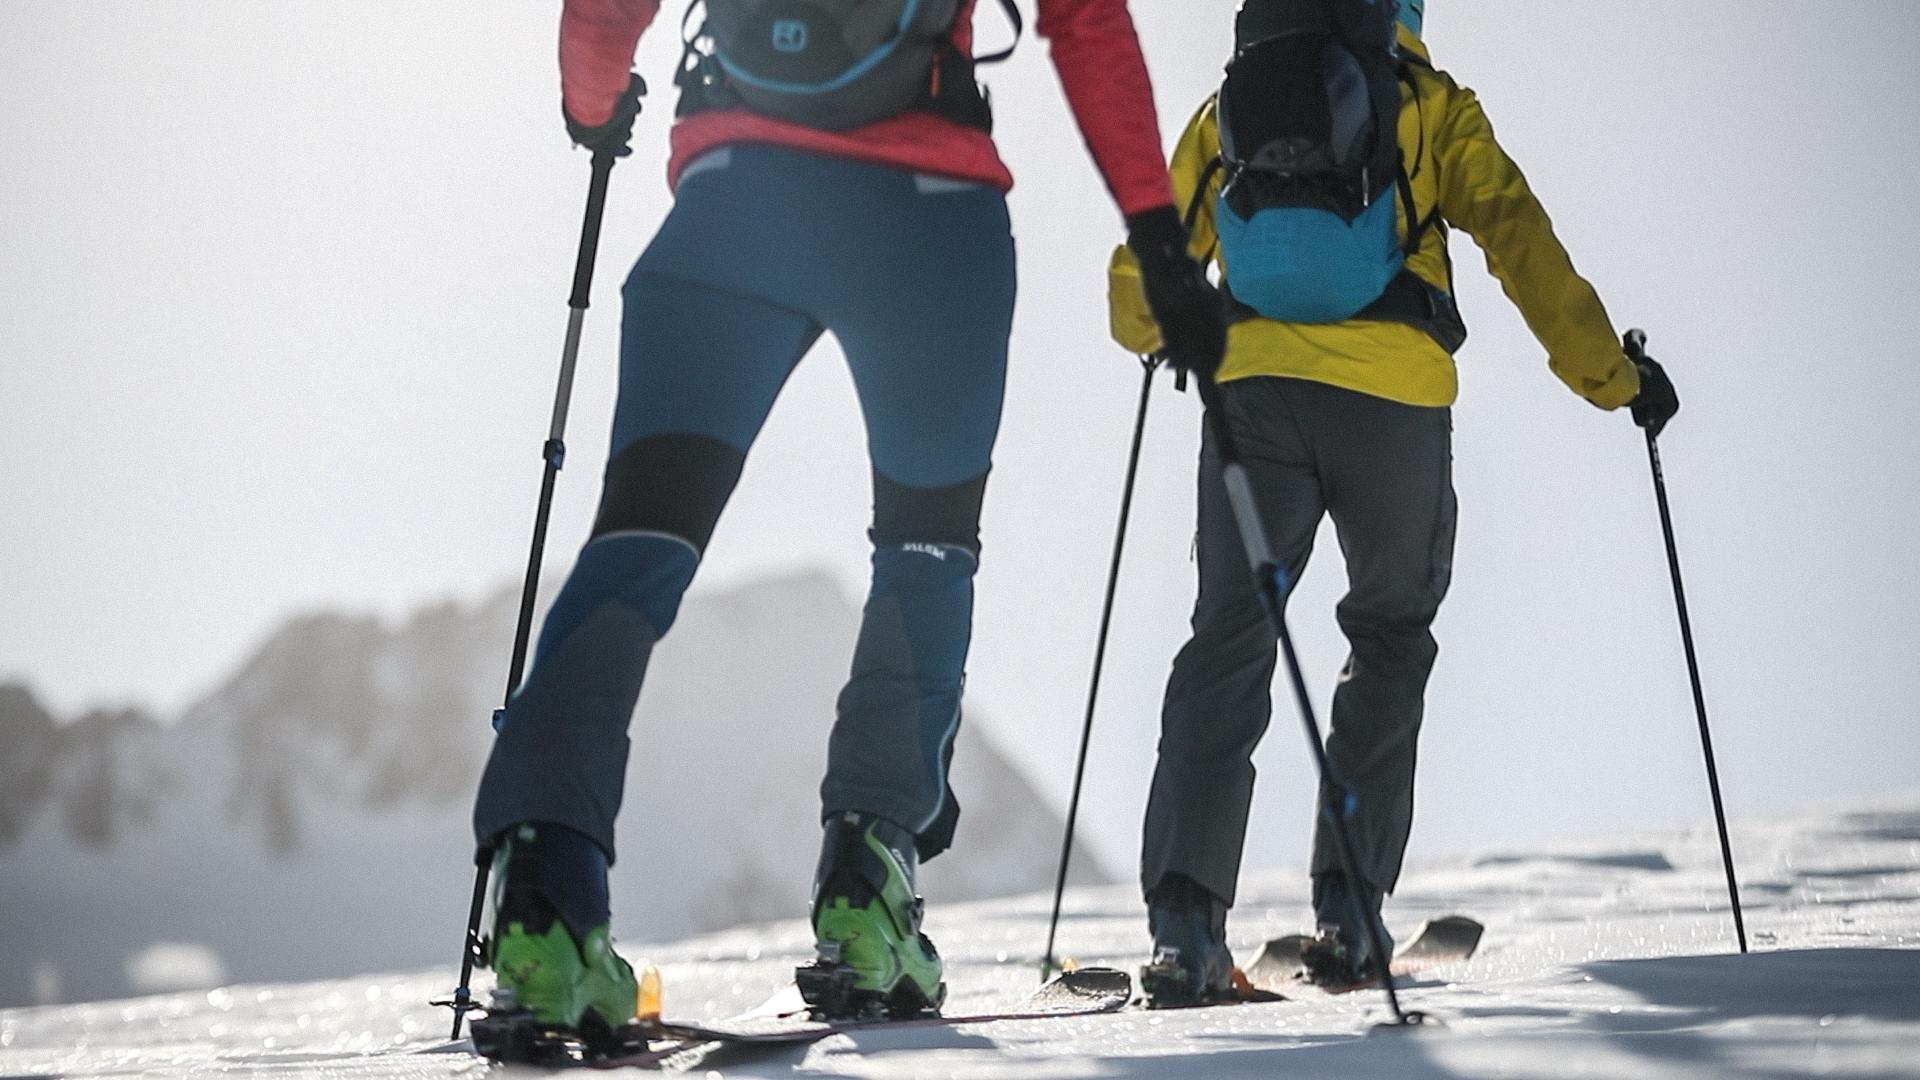 beechstudios sport schuster skitour 04